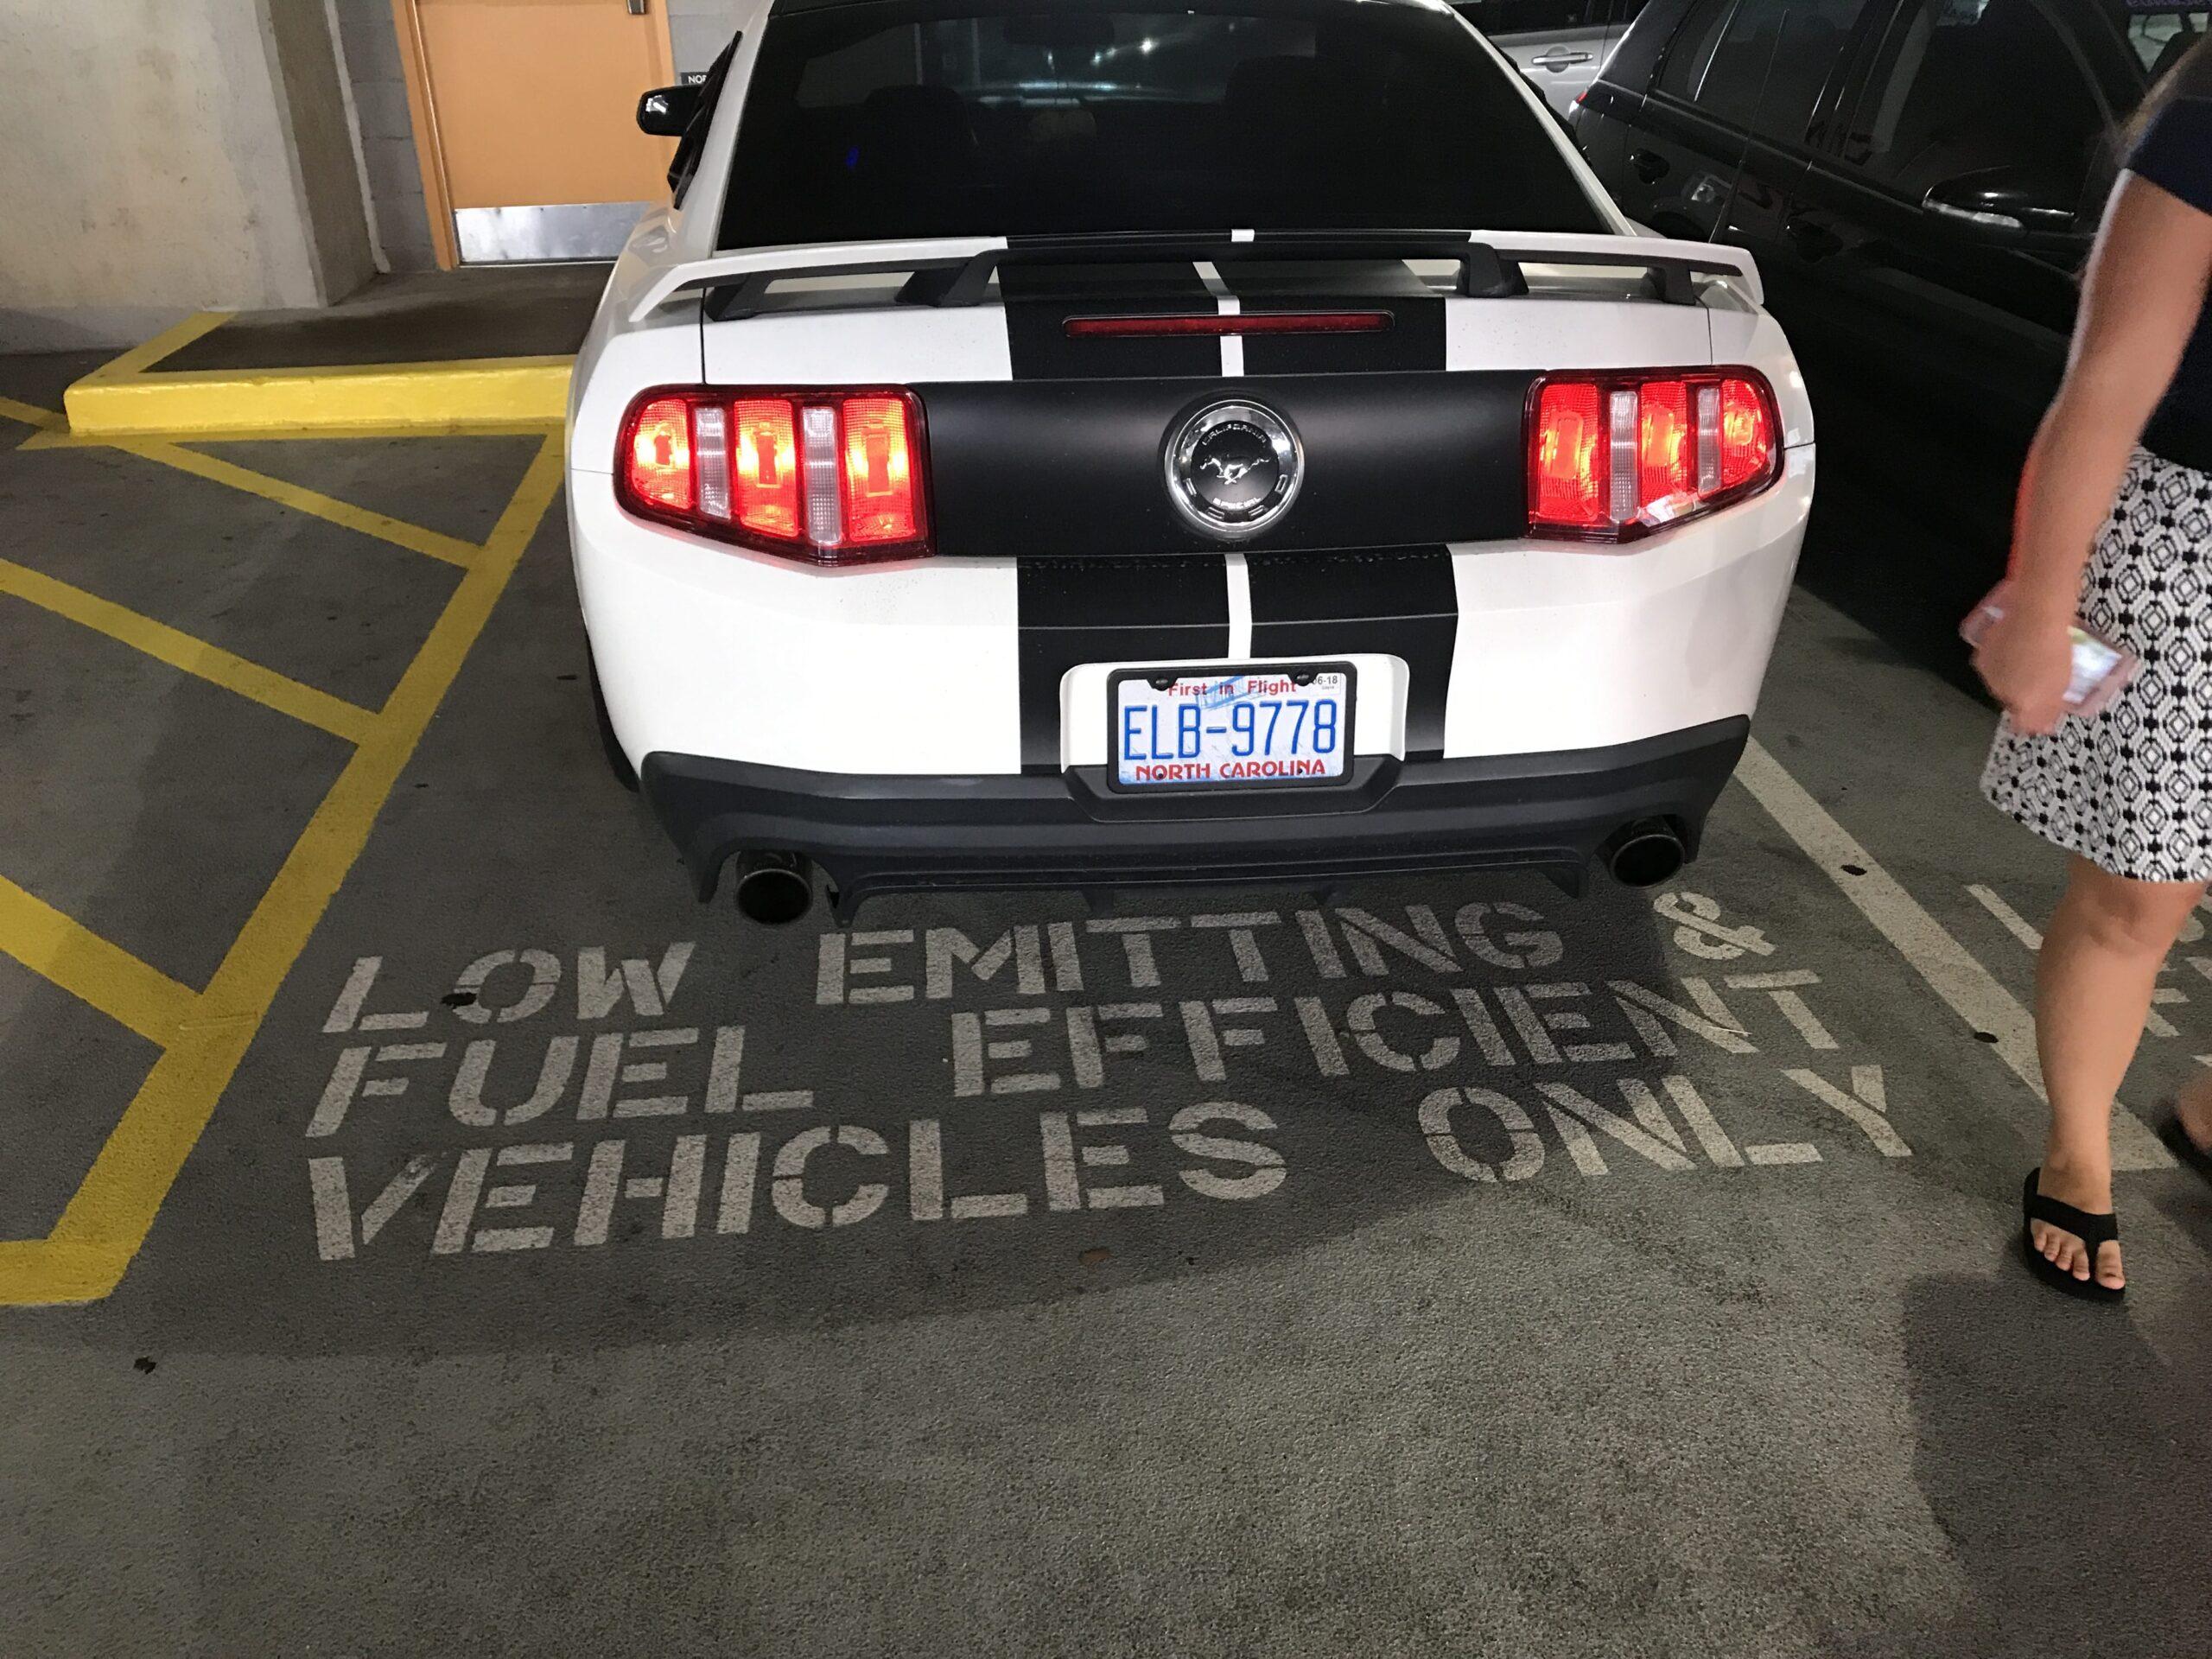 Dalton Smith - Princeton NC - 2011 Mustang GT